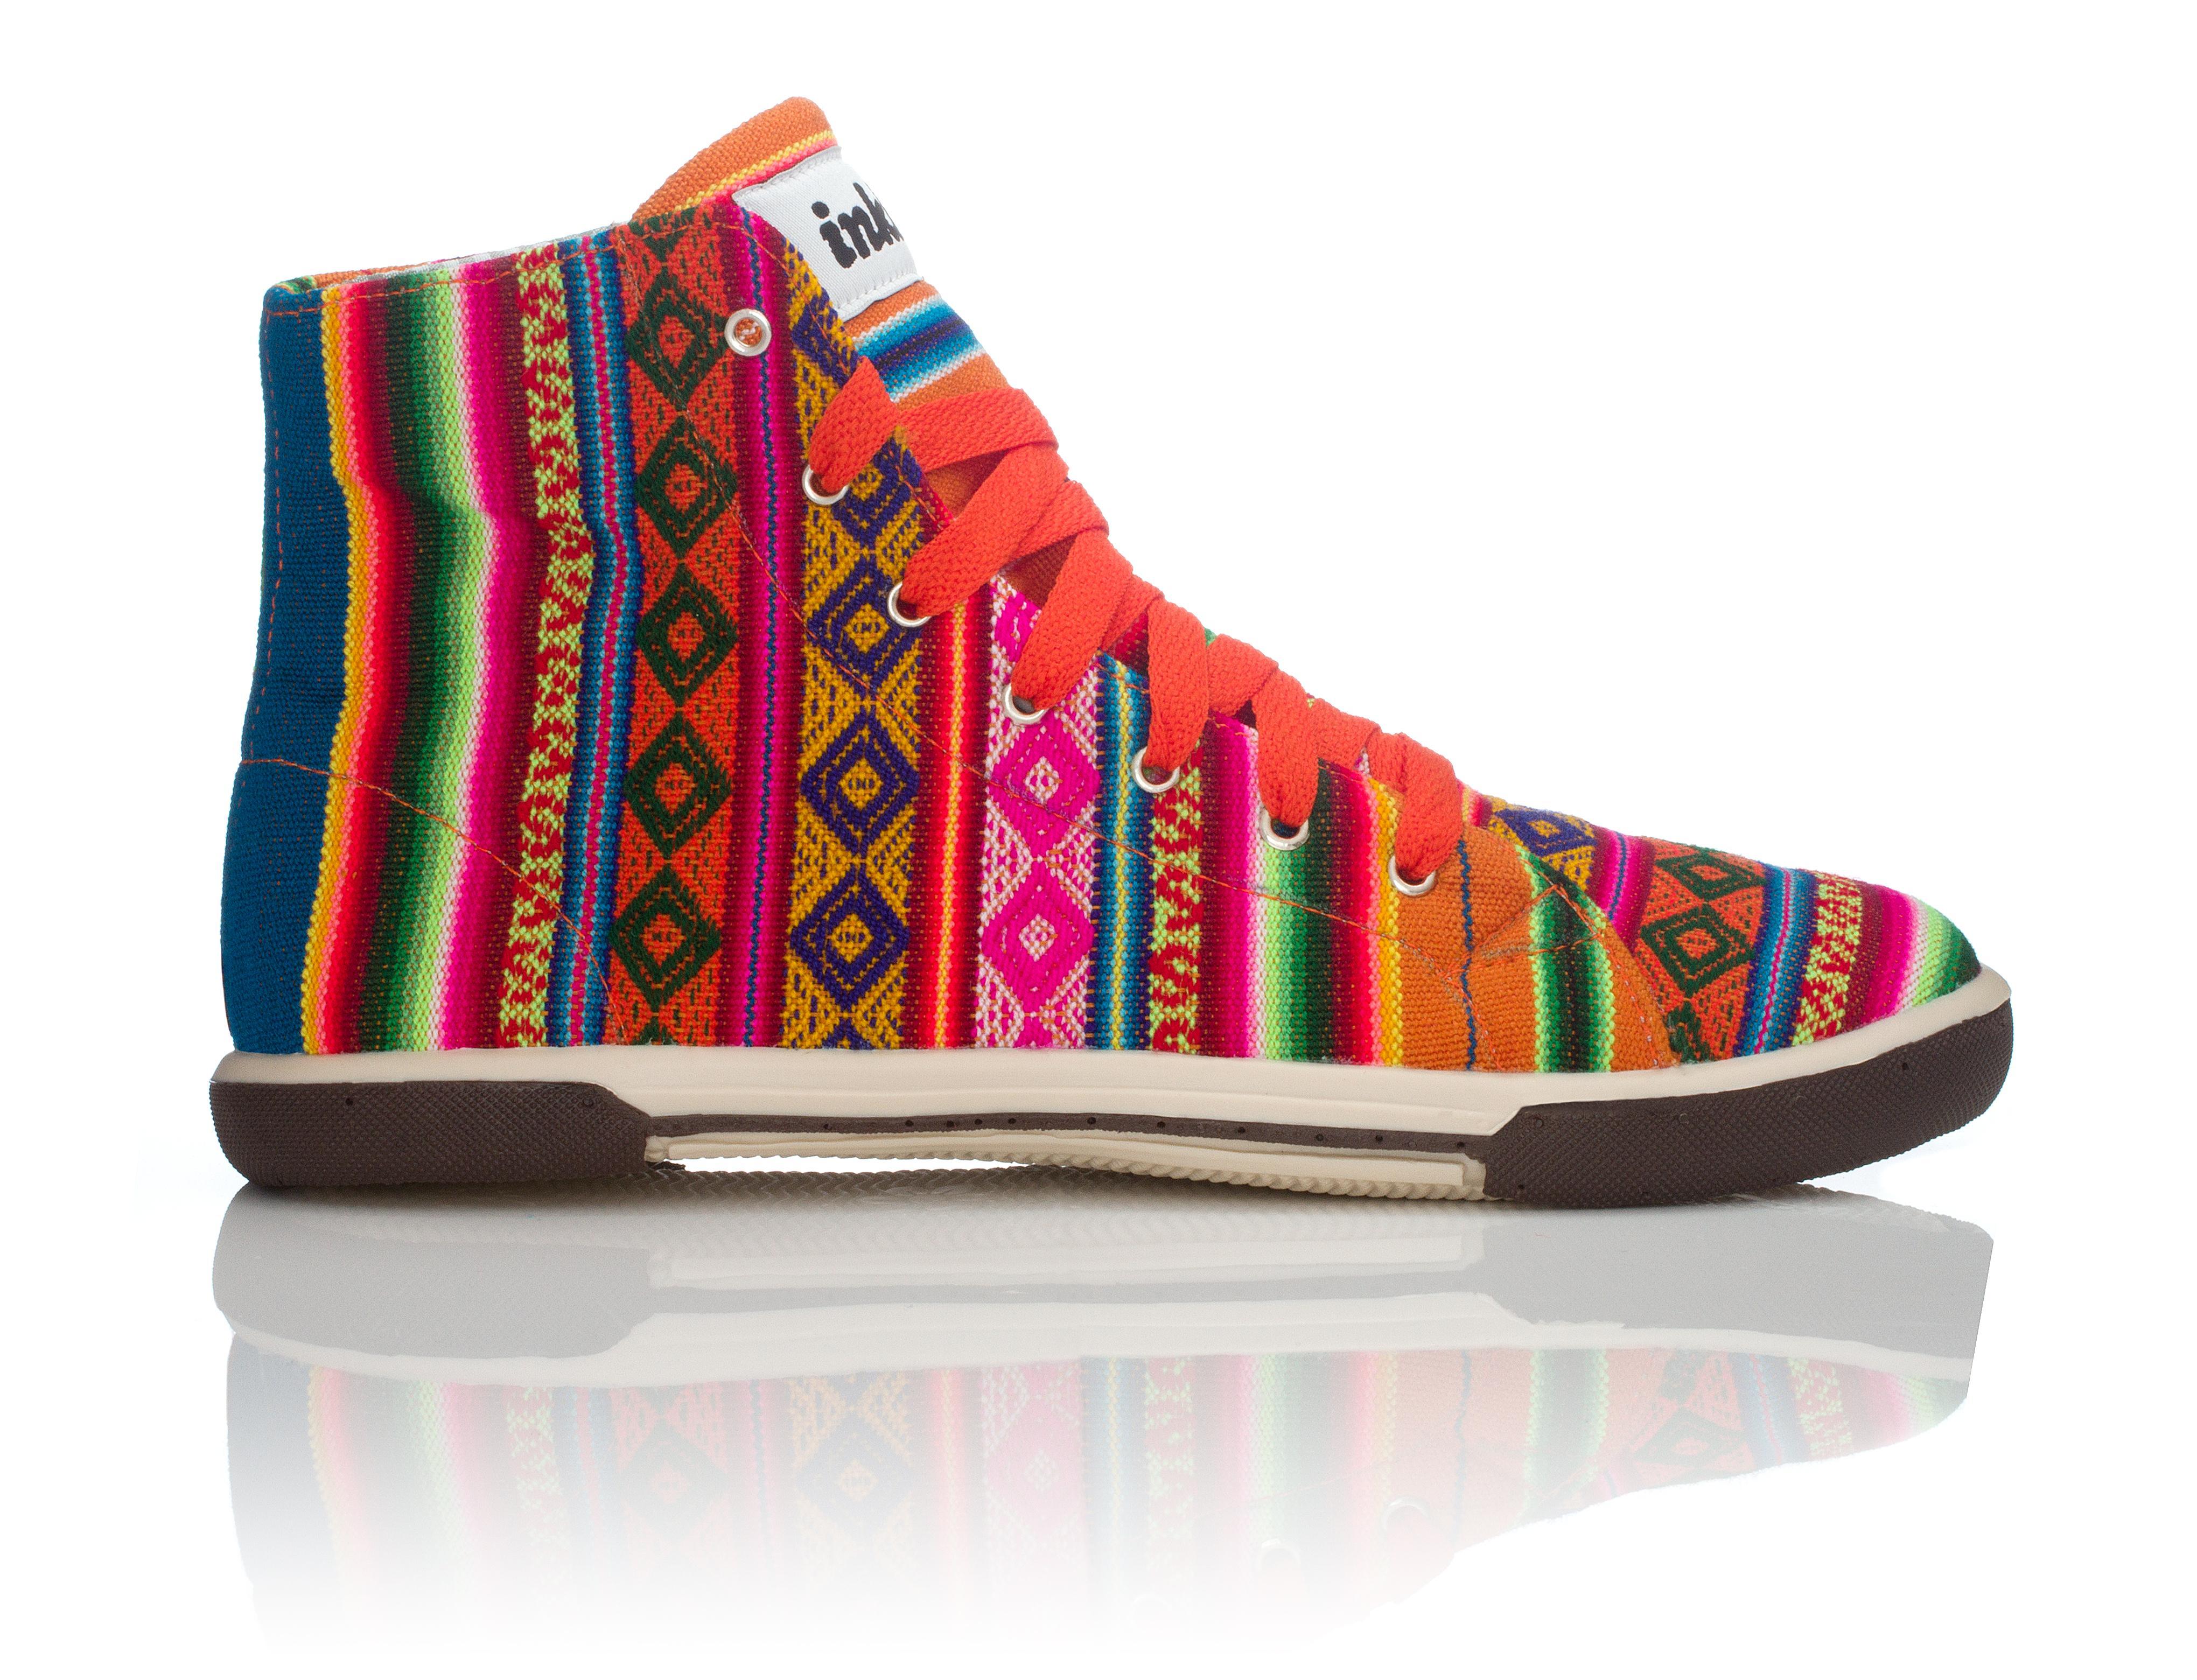 Inkkas Orange Juice Shoes